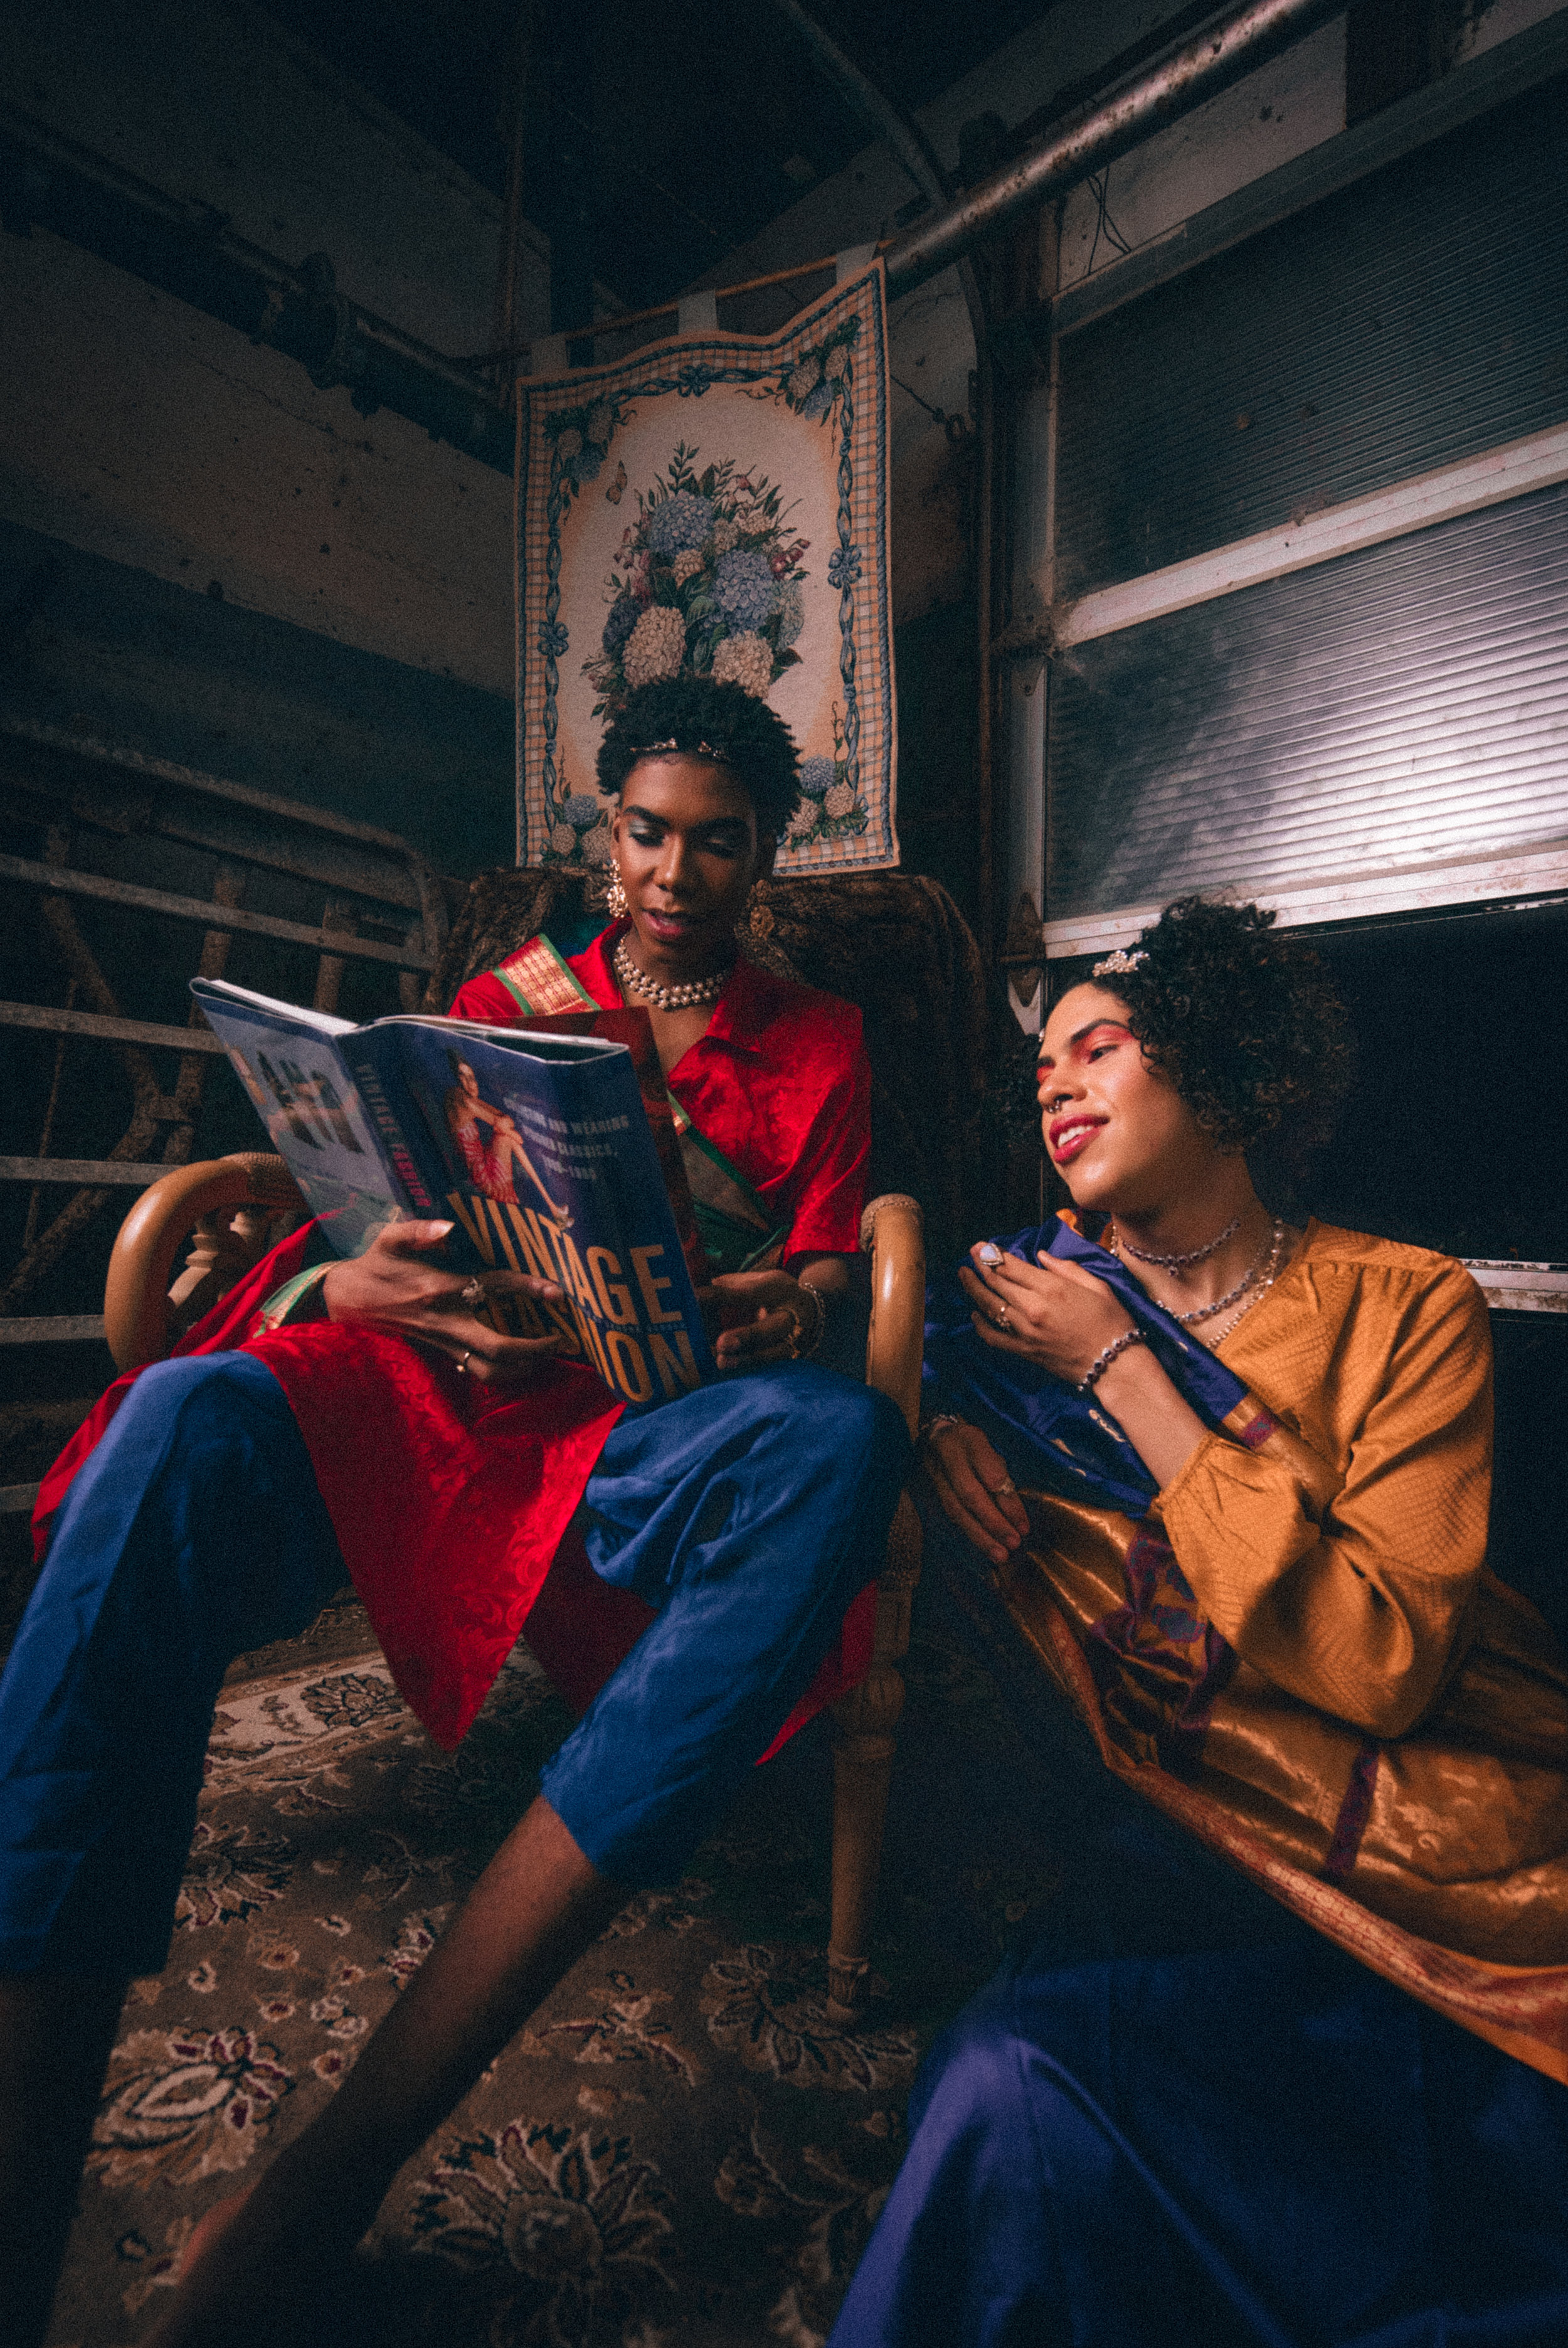 Kyle & Taylor: a love story - by Amie B. Rodriguez, June 2019 KALTBLUT., DEU